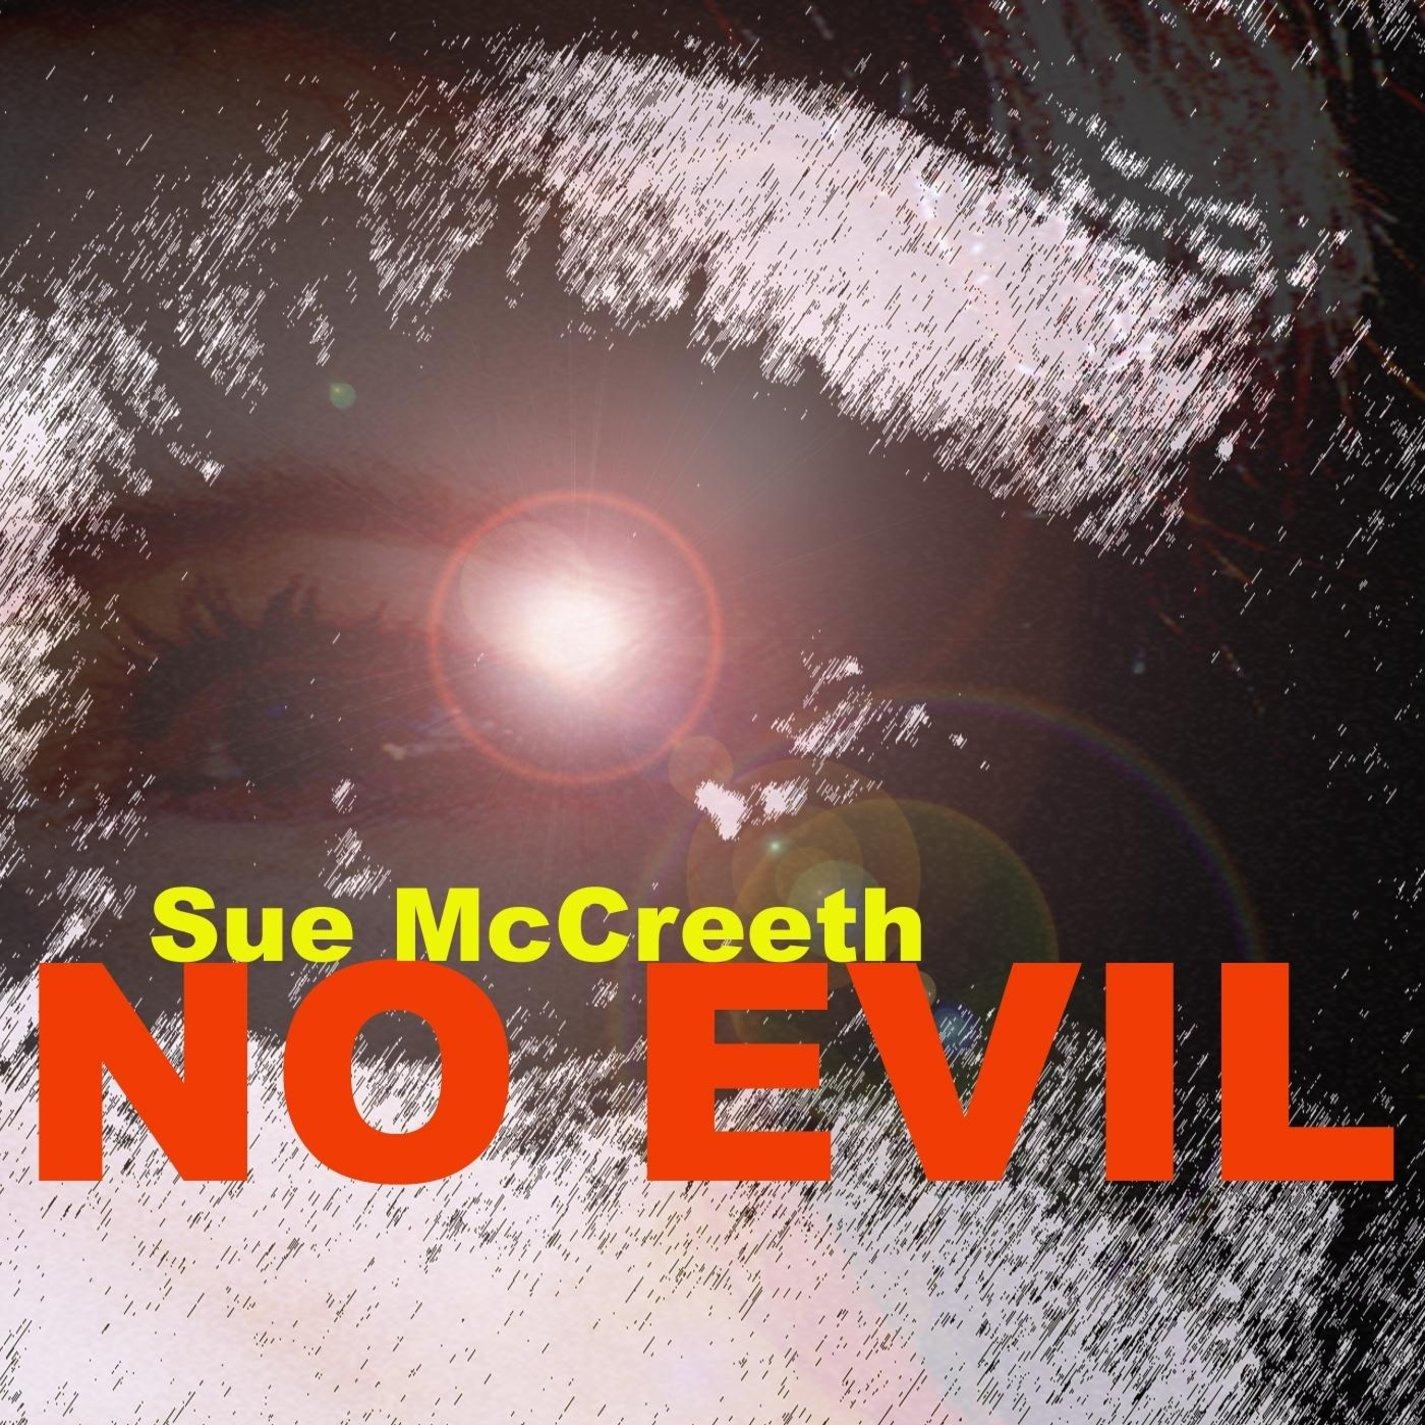 No Evil CD Front Cover - Sue McCreeth